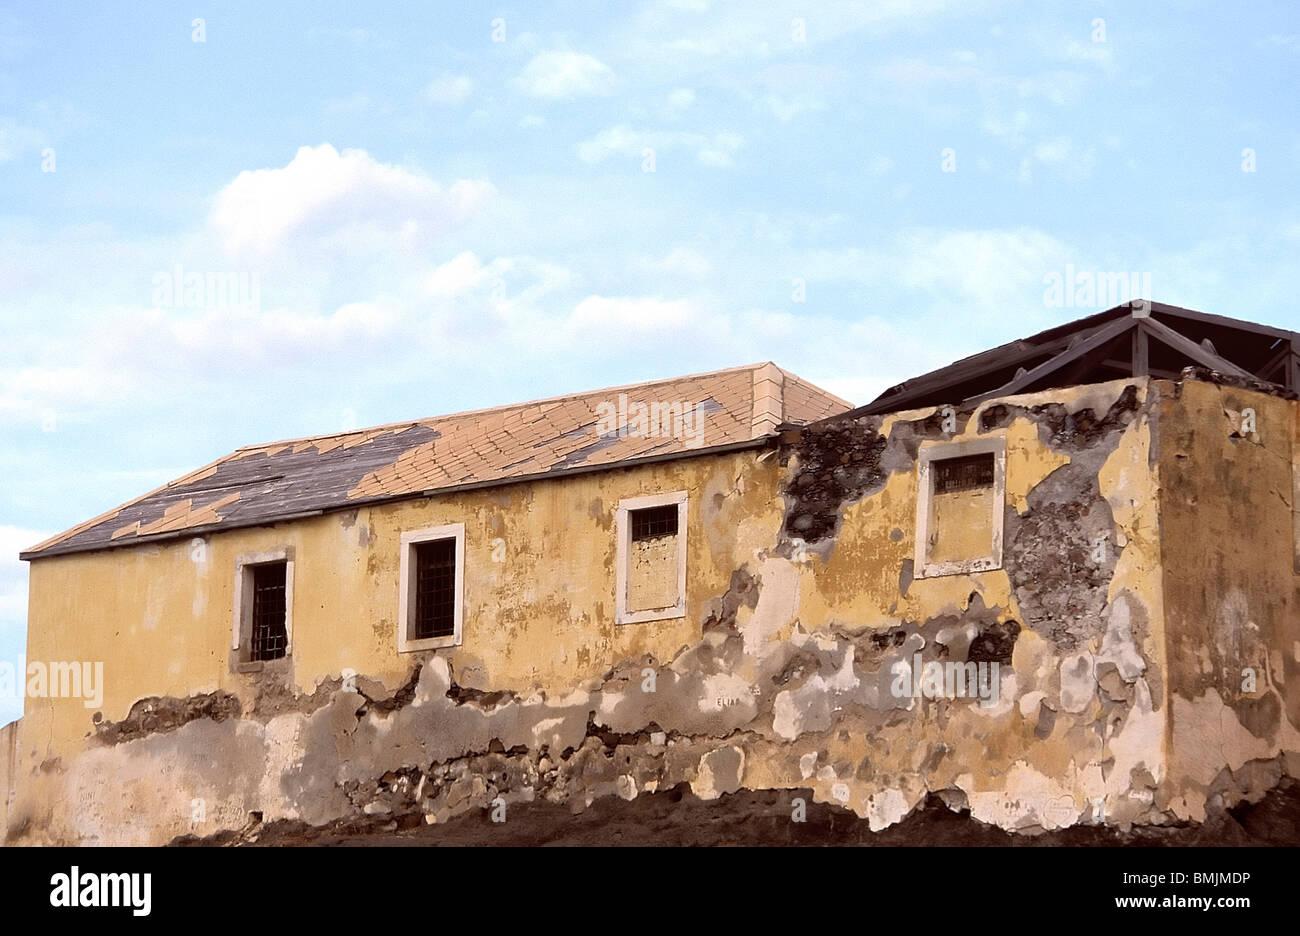 Fortim d'el-Rei in Mindelo, Sao Vicente, Cape Verde Islands Stock Photo